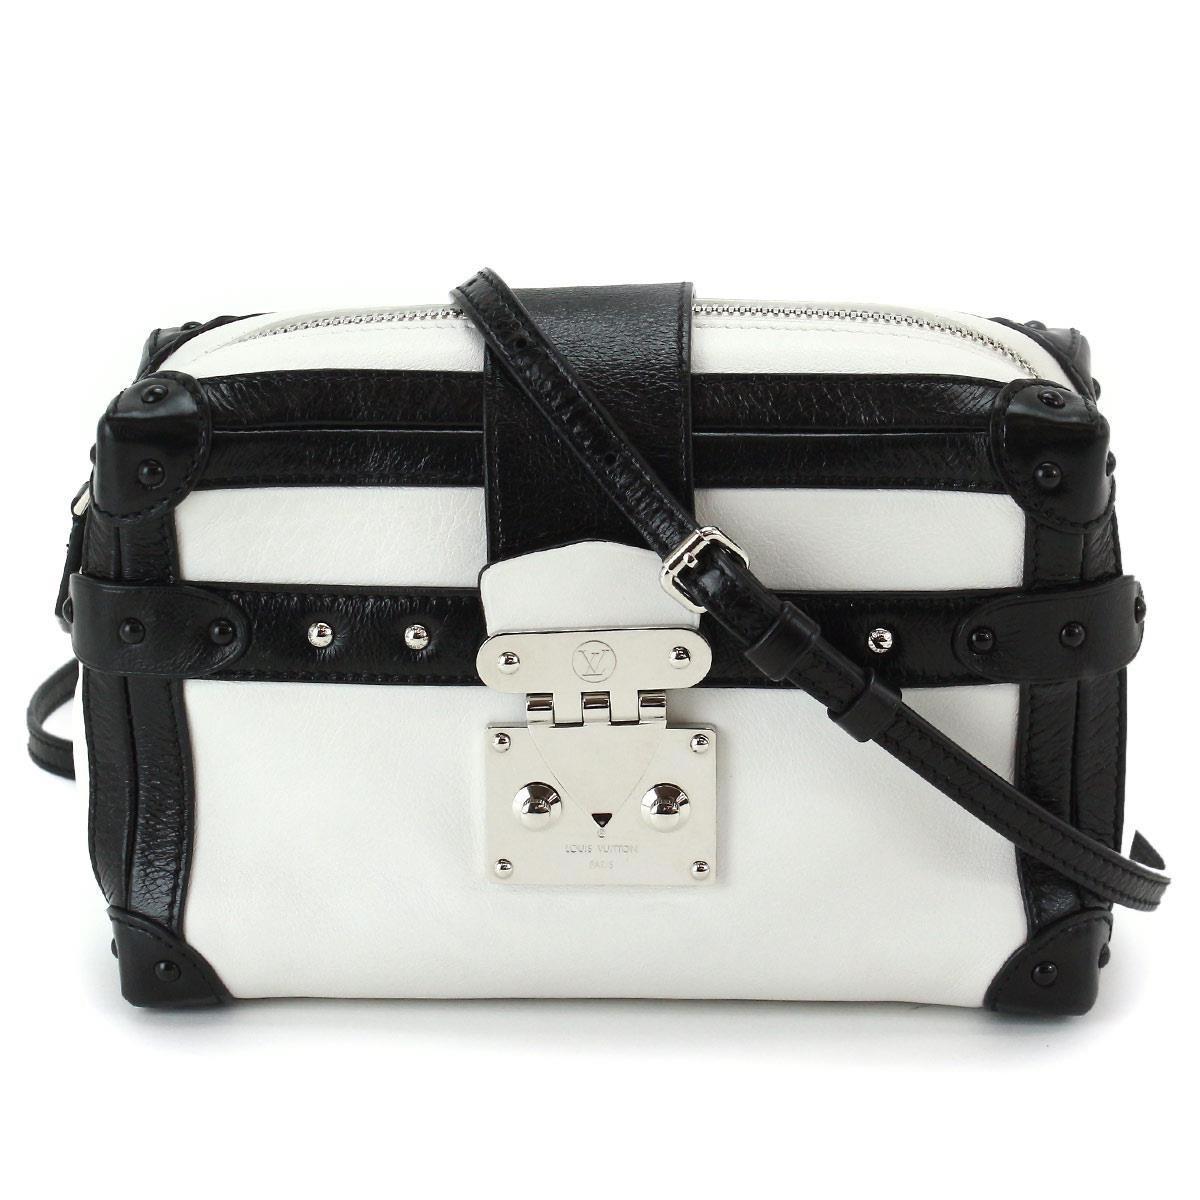 e5d19c94ff8 Gallery. Previously sold at: Reebonz · Women's Box Bags Women's Louis  Vuitton Petite Malle